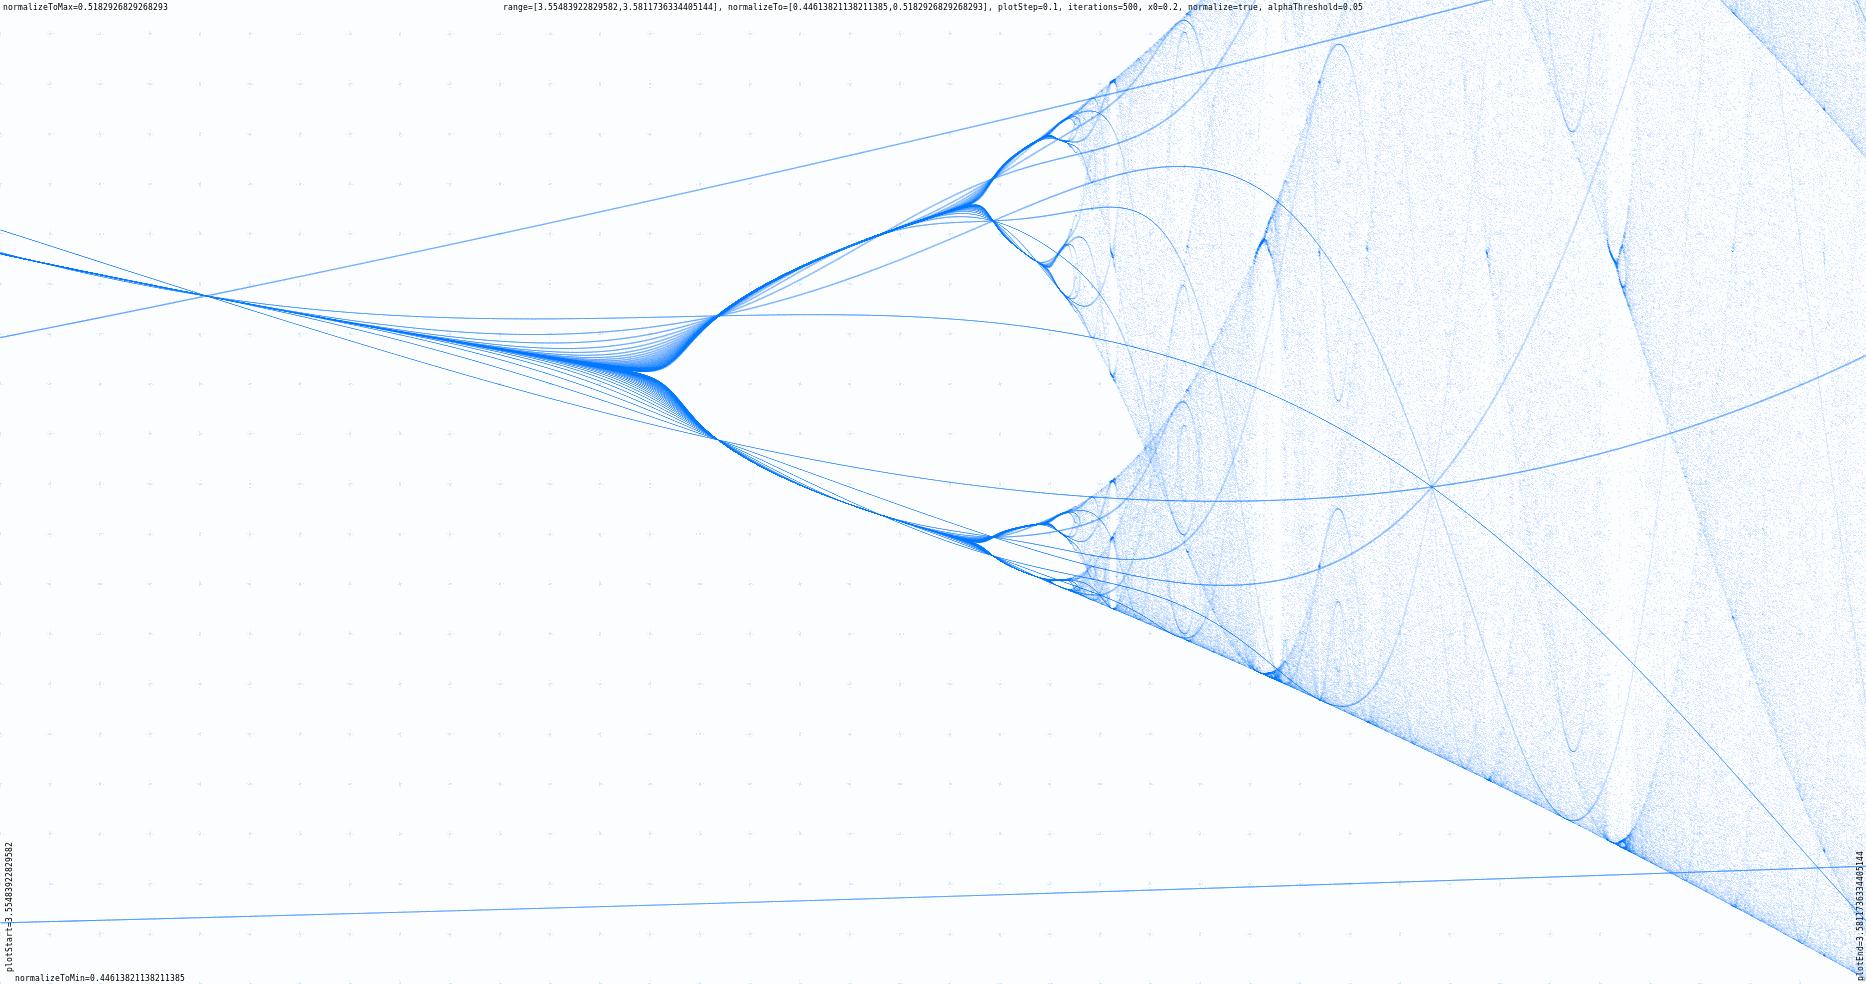 Plotting the Feigenbaum bifurcation